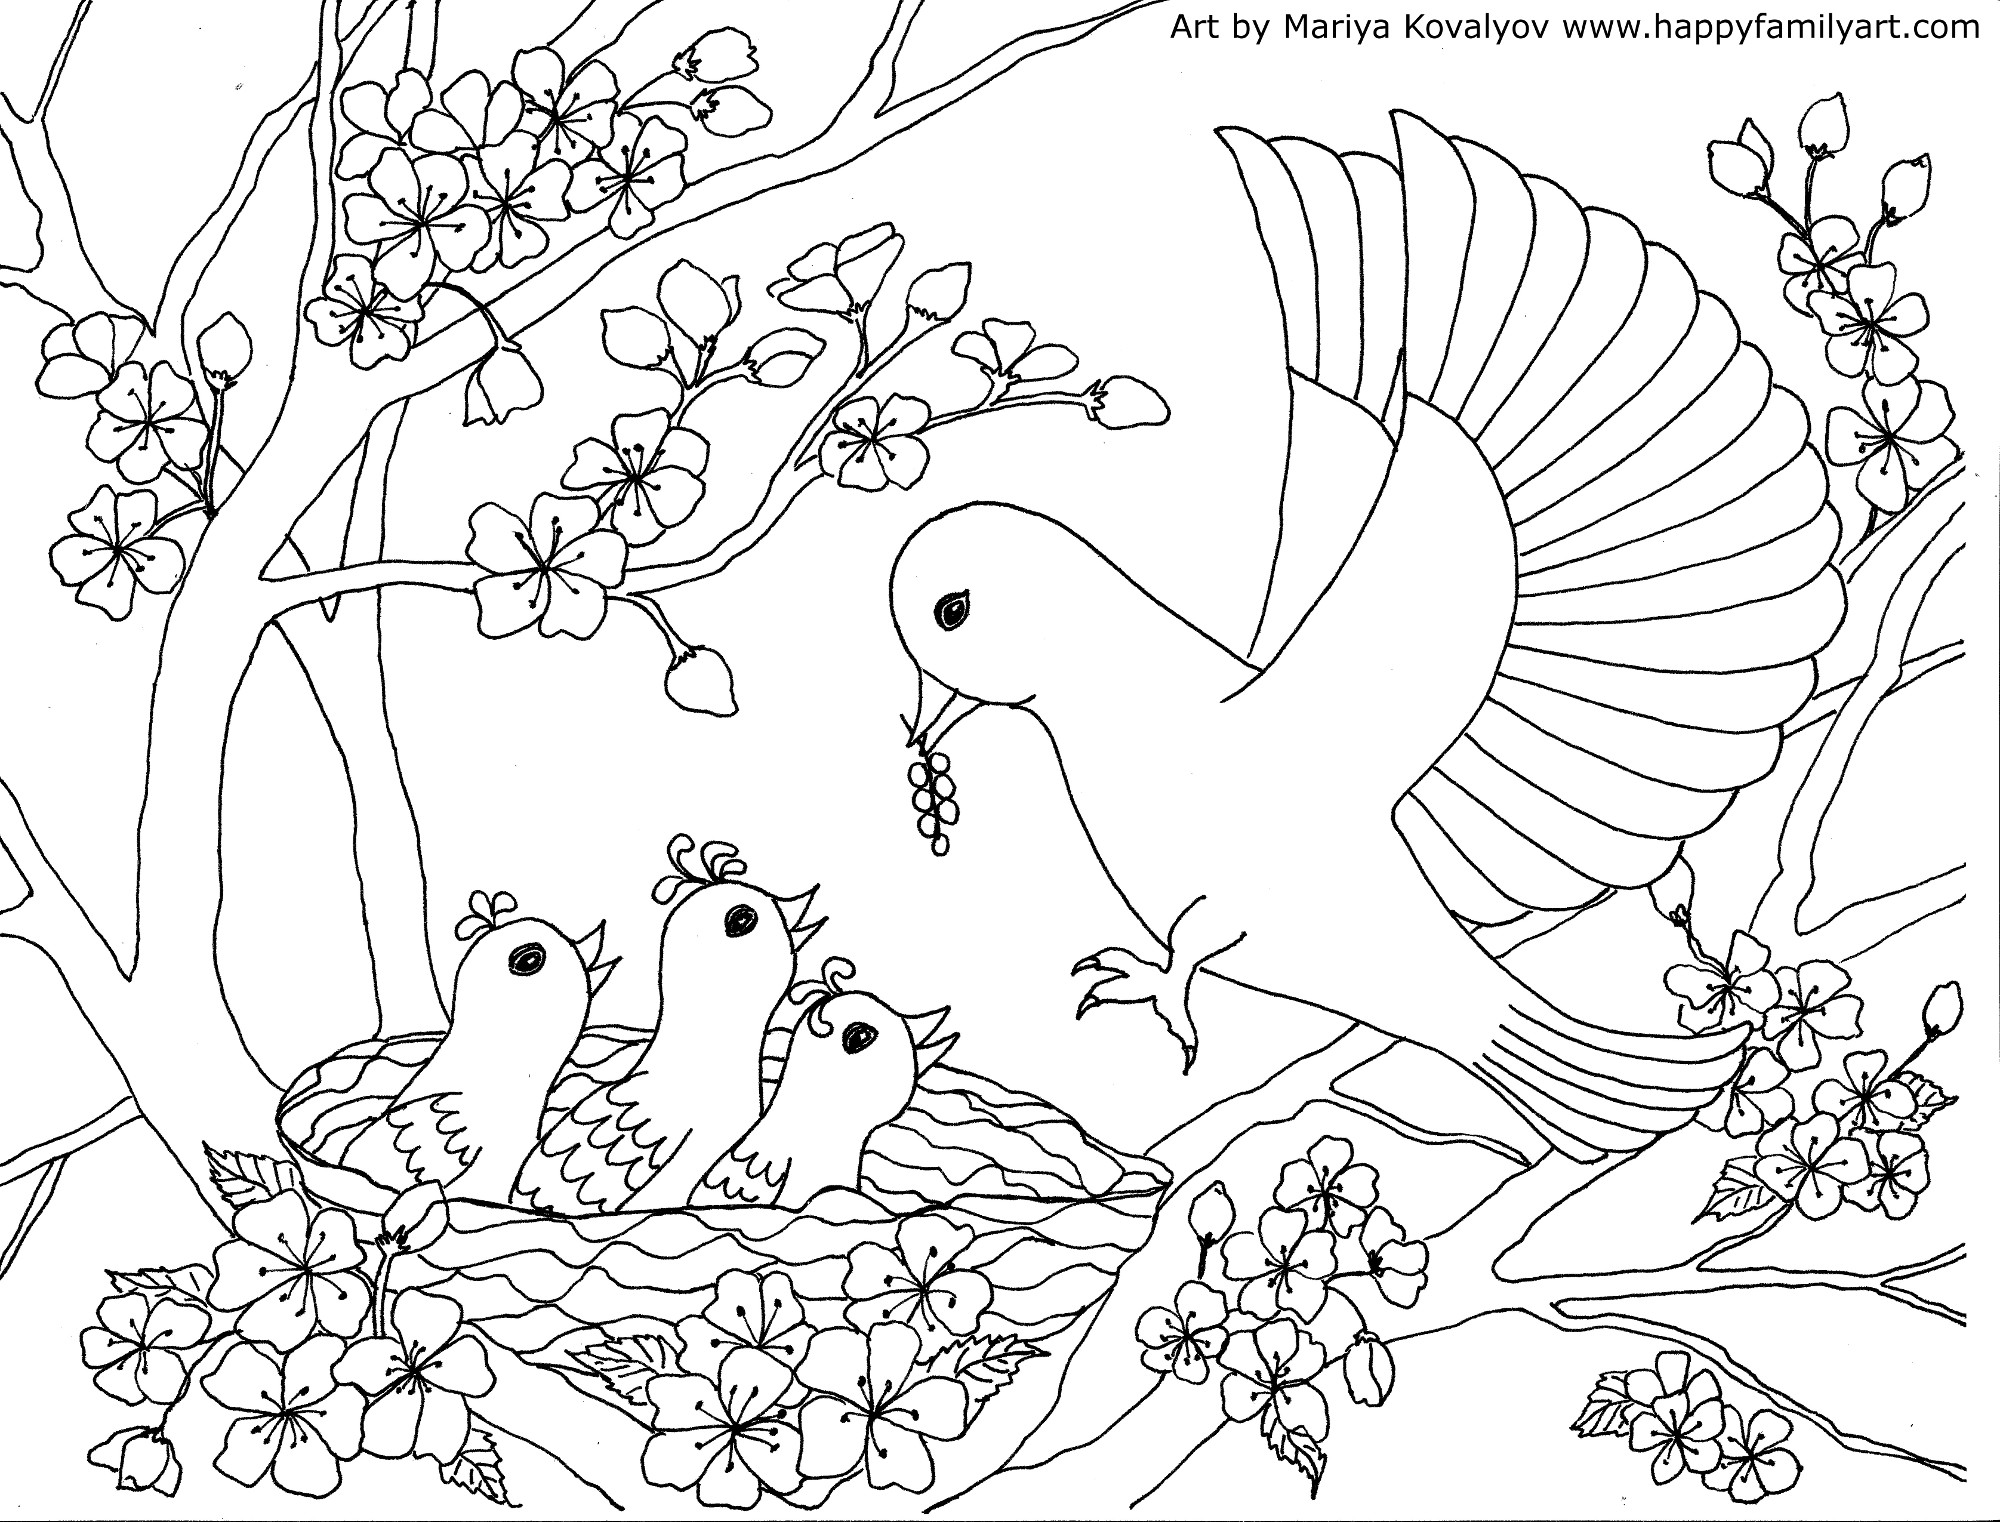 2000x1522 Happy Family Art